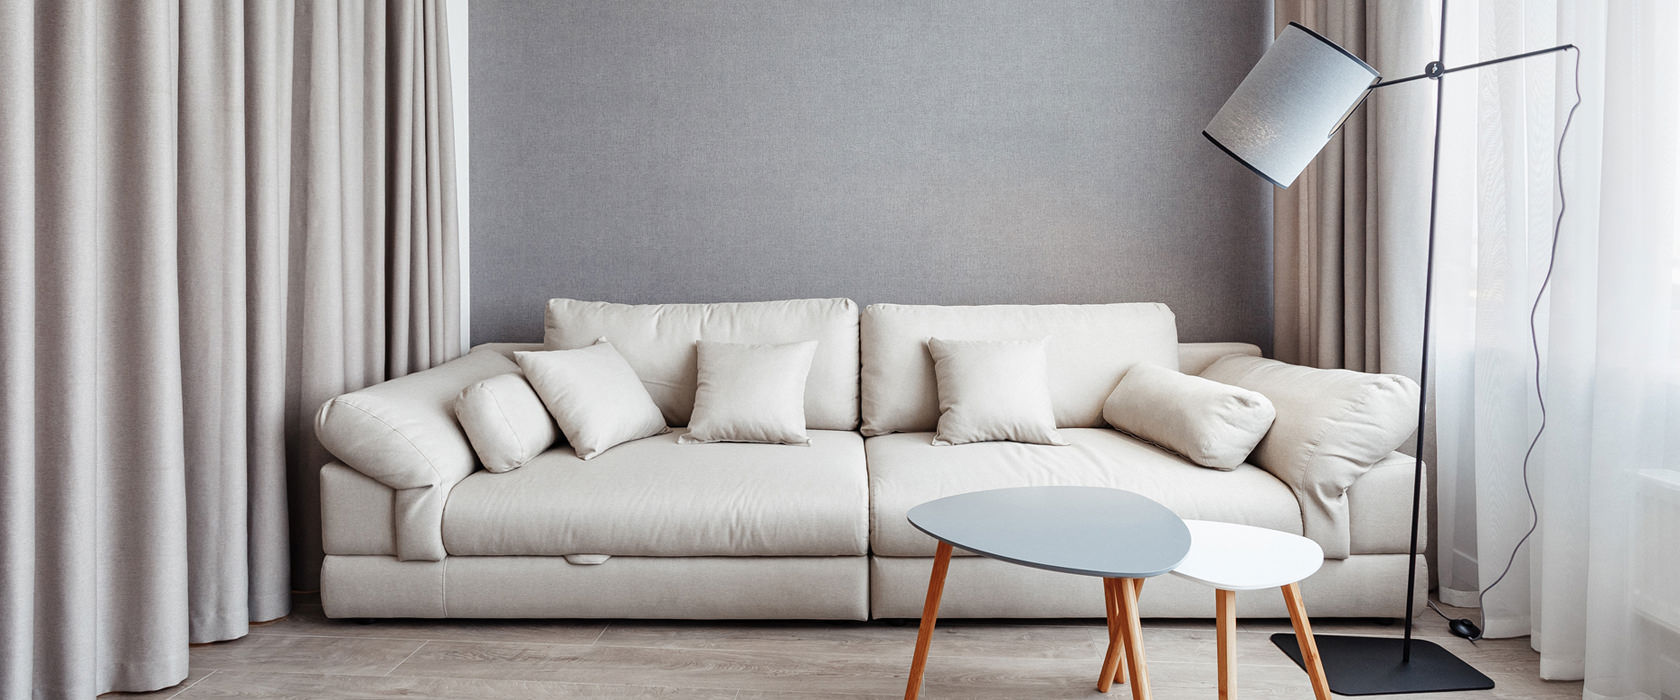 Тримісний диван Claudia - Фото 2 - Pufetto